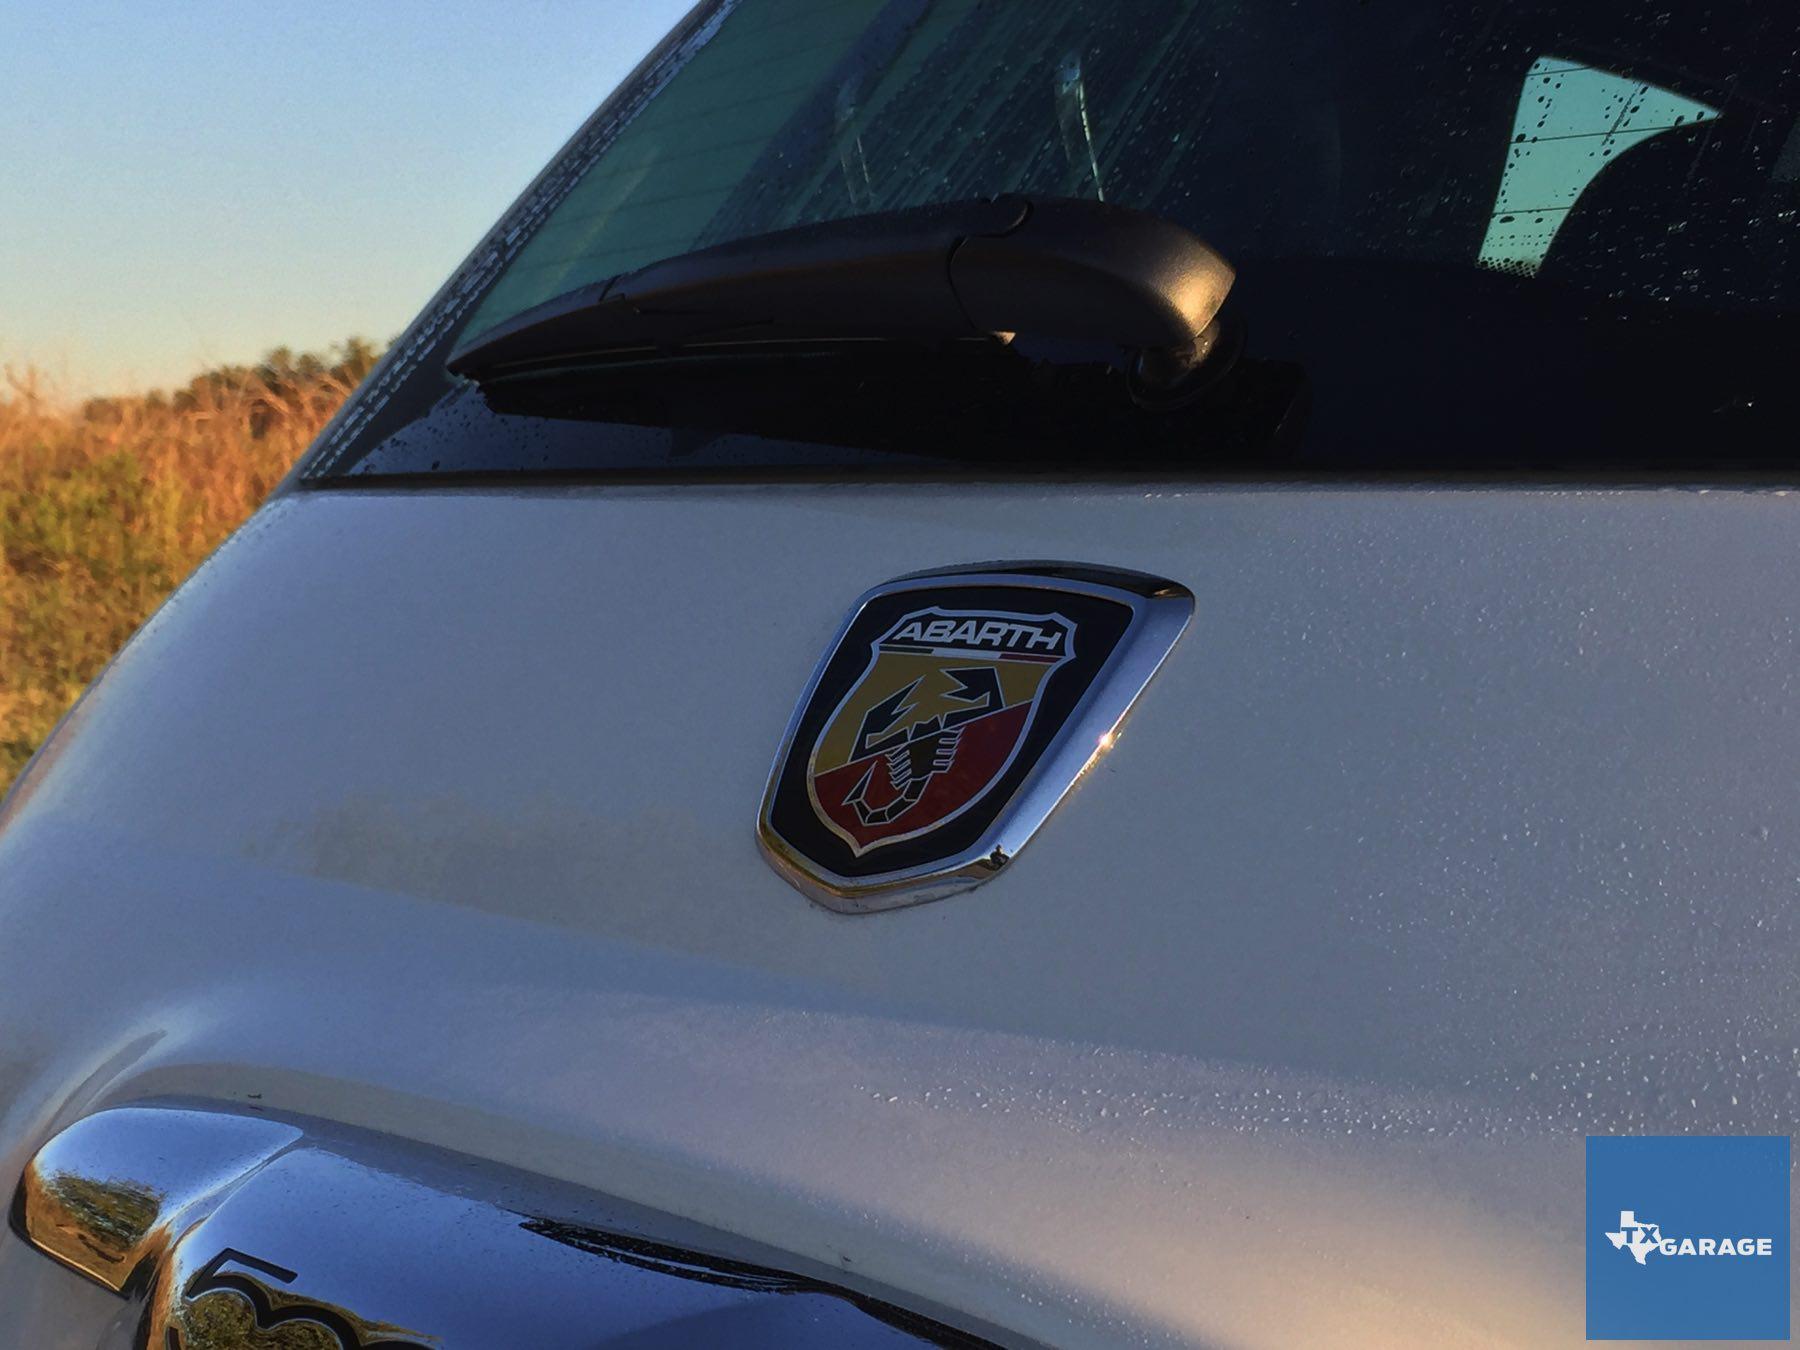 2015-Fiat-500-Abarth-txGarage-023